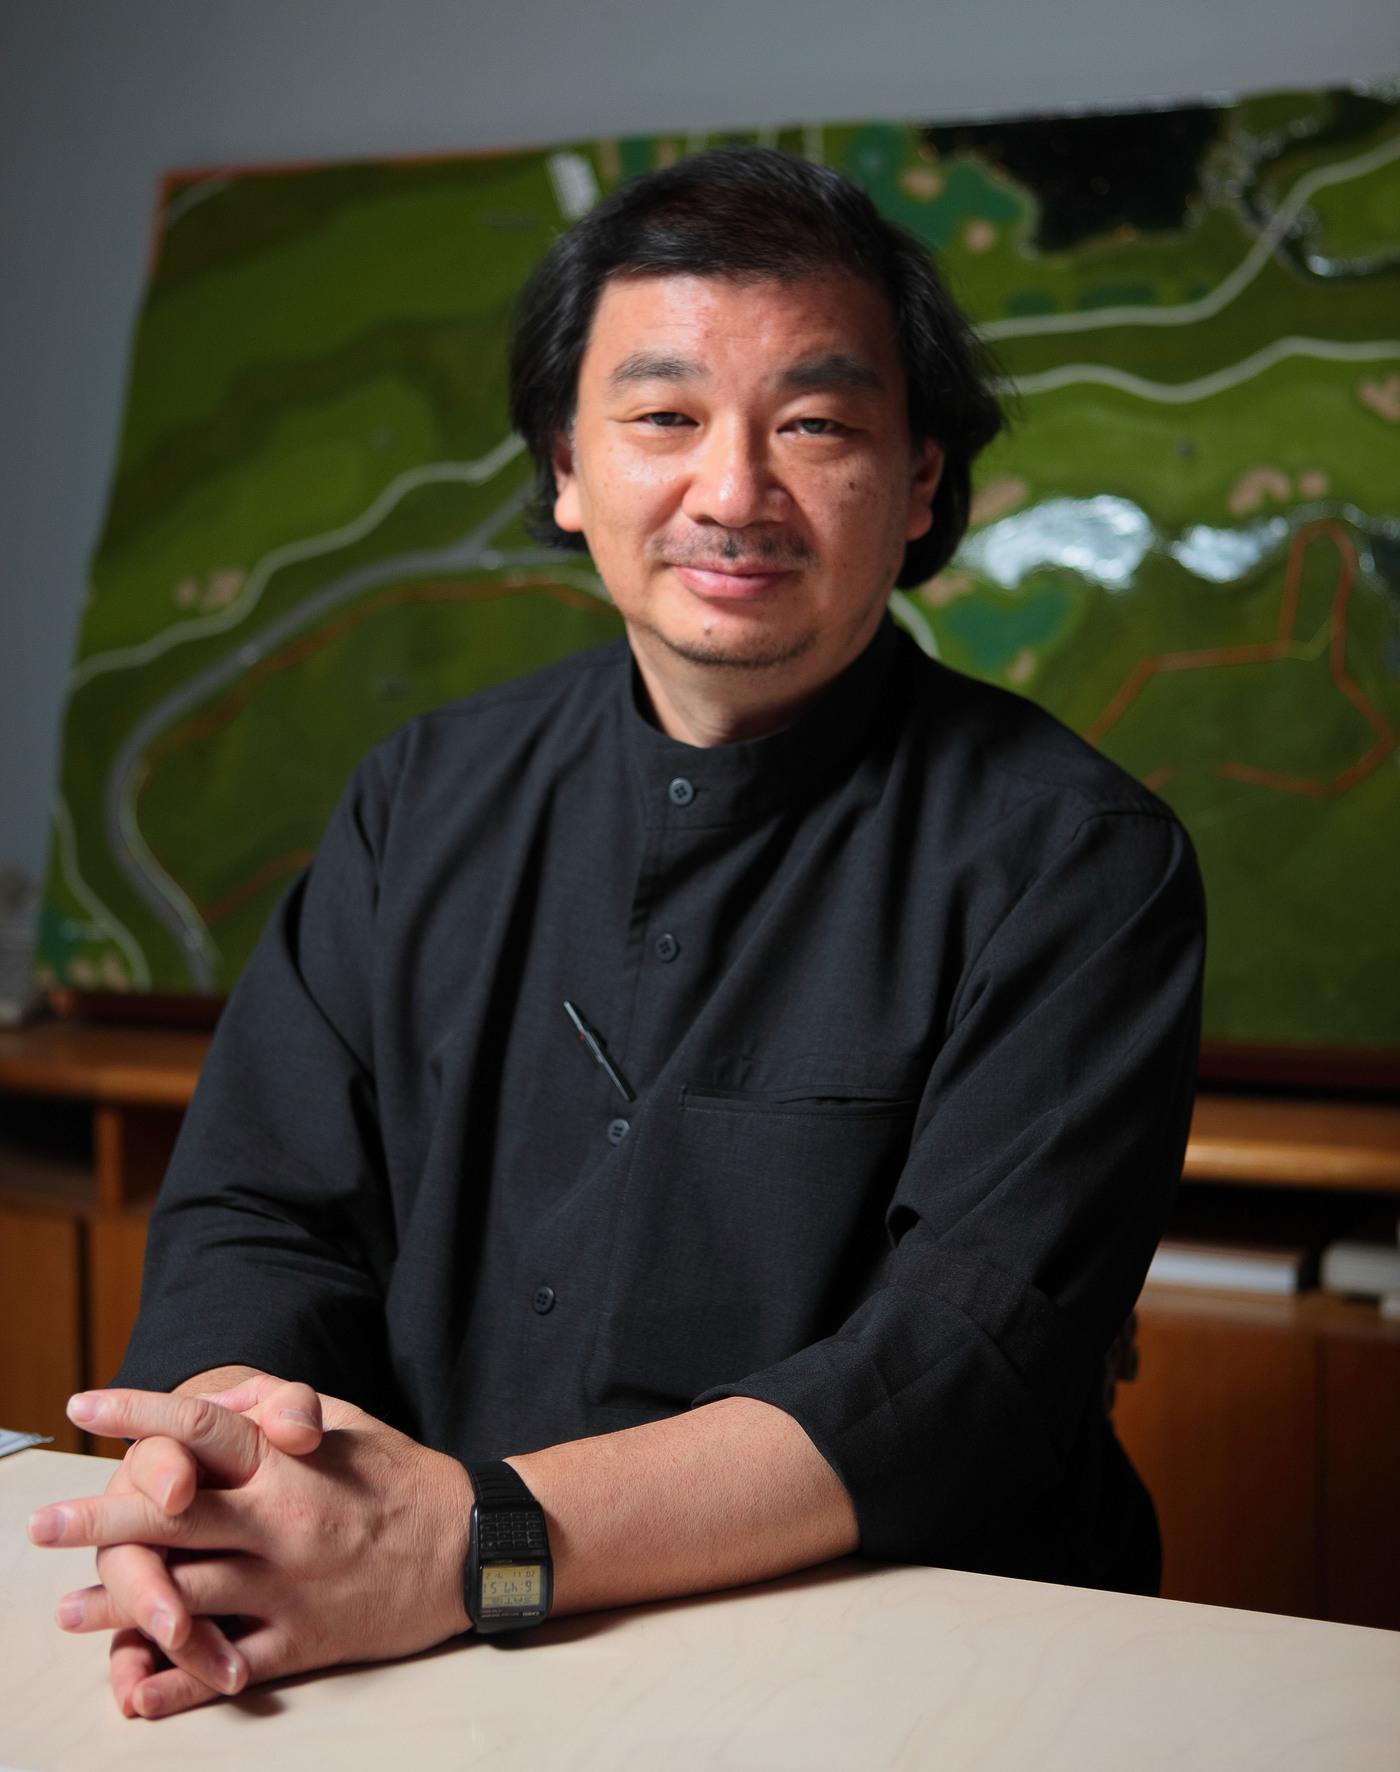 Shigeru Ban Named the 2014 Pritzker Architecture Prize